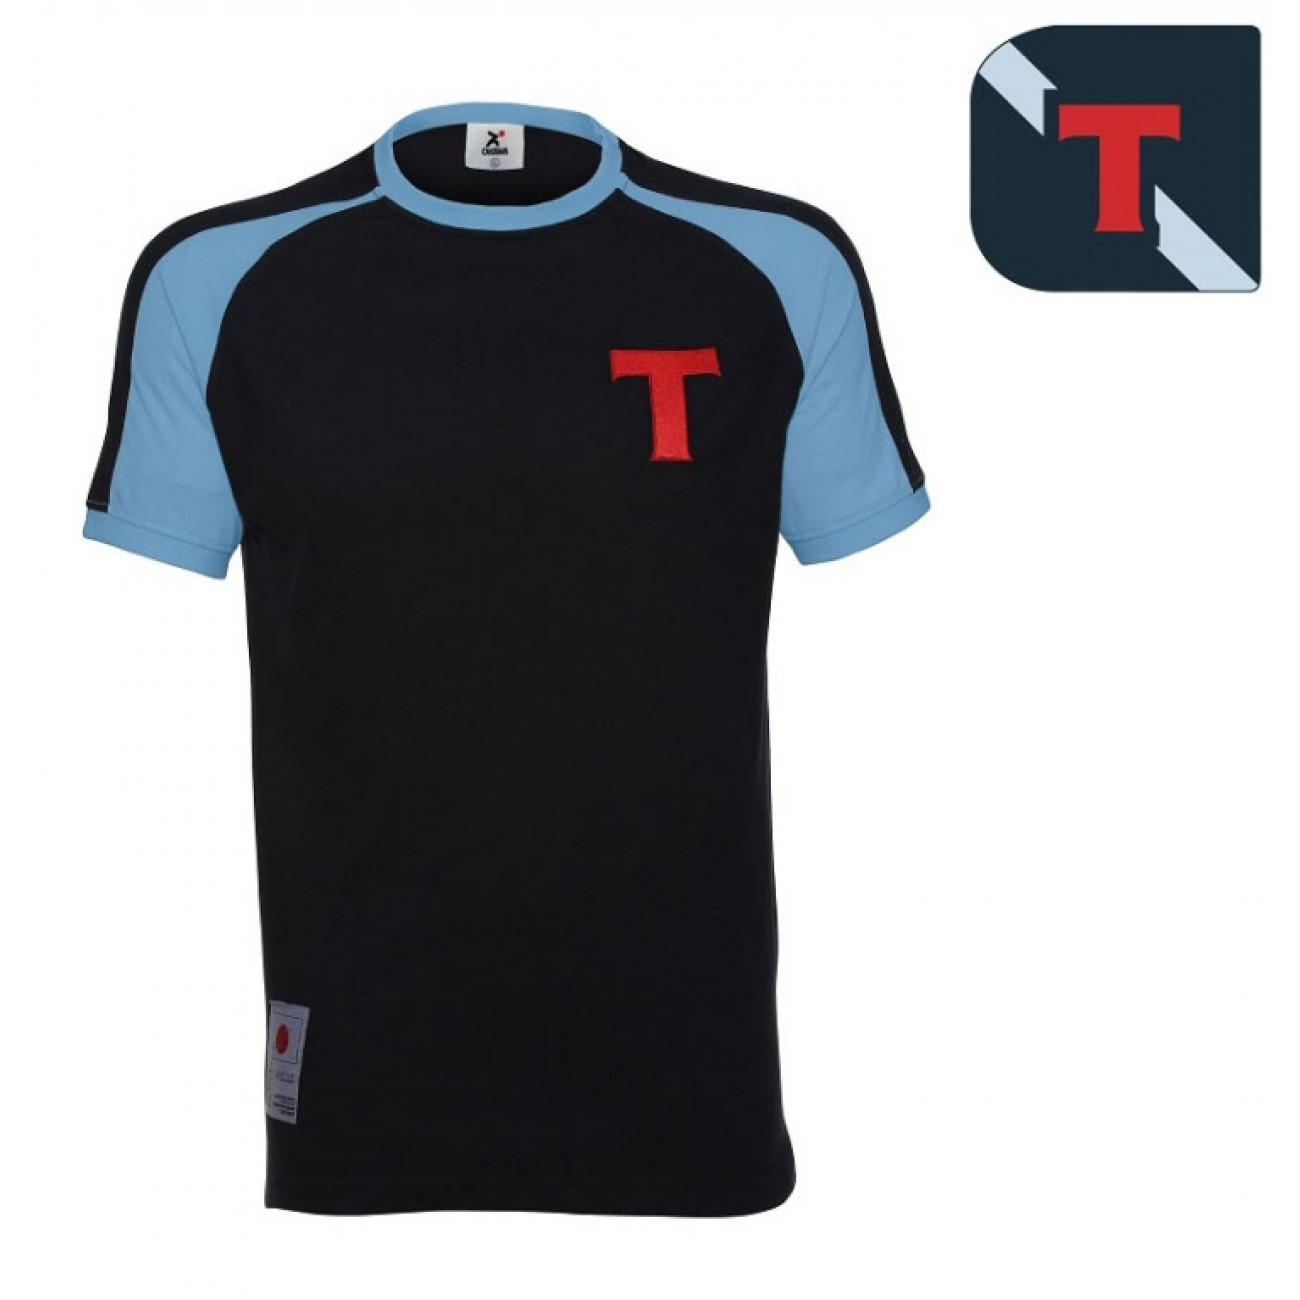 http://www.retrofootball.es/ropa-de-futbol/camiseta-toho.html